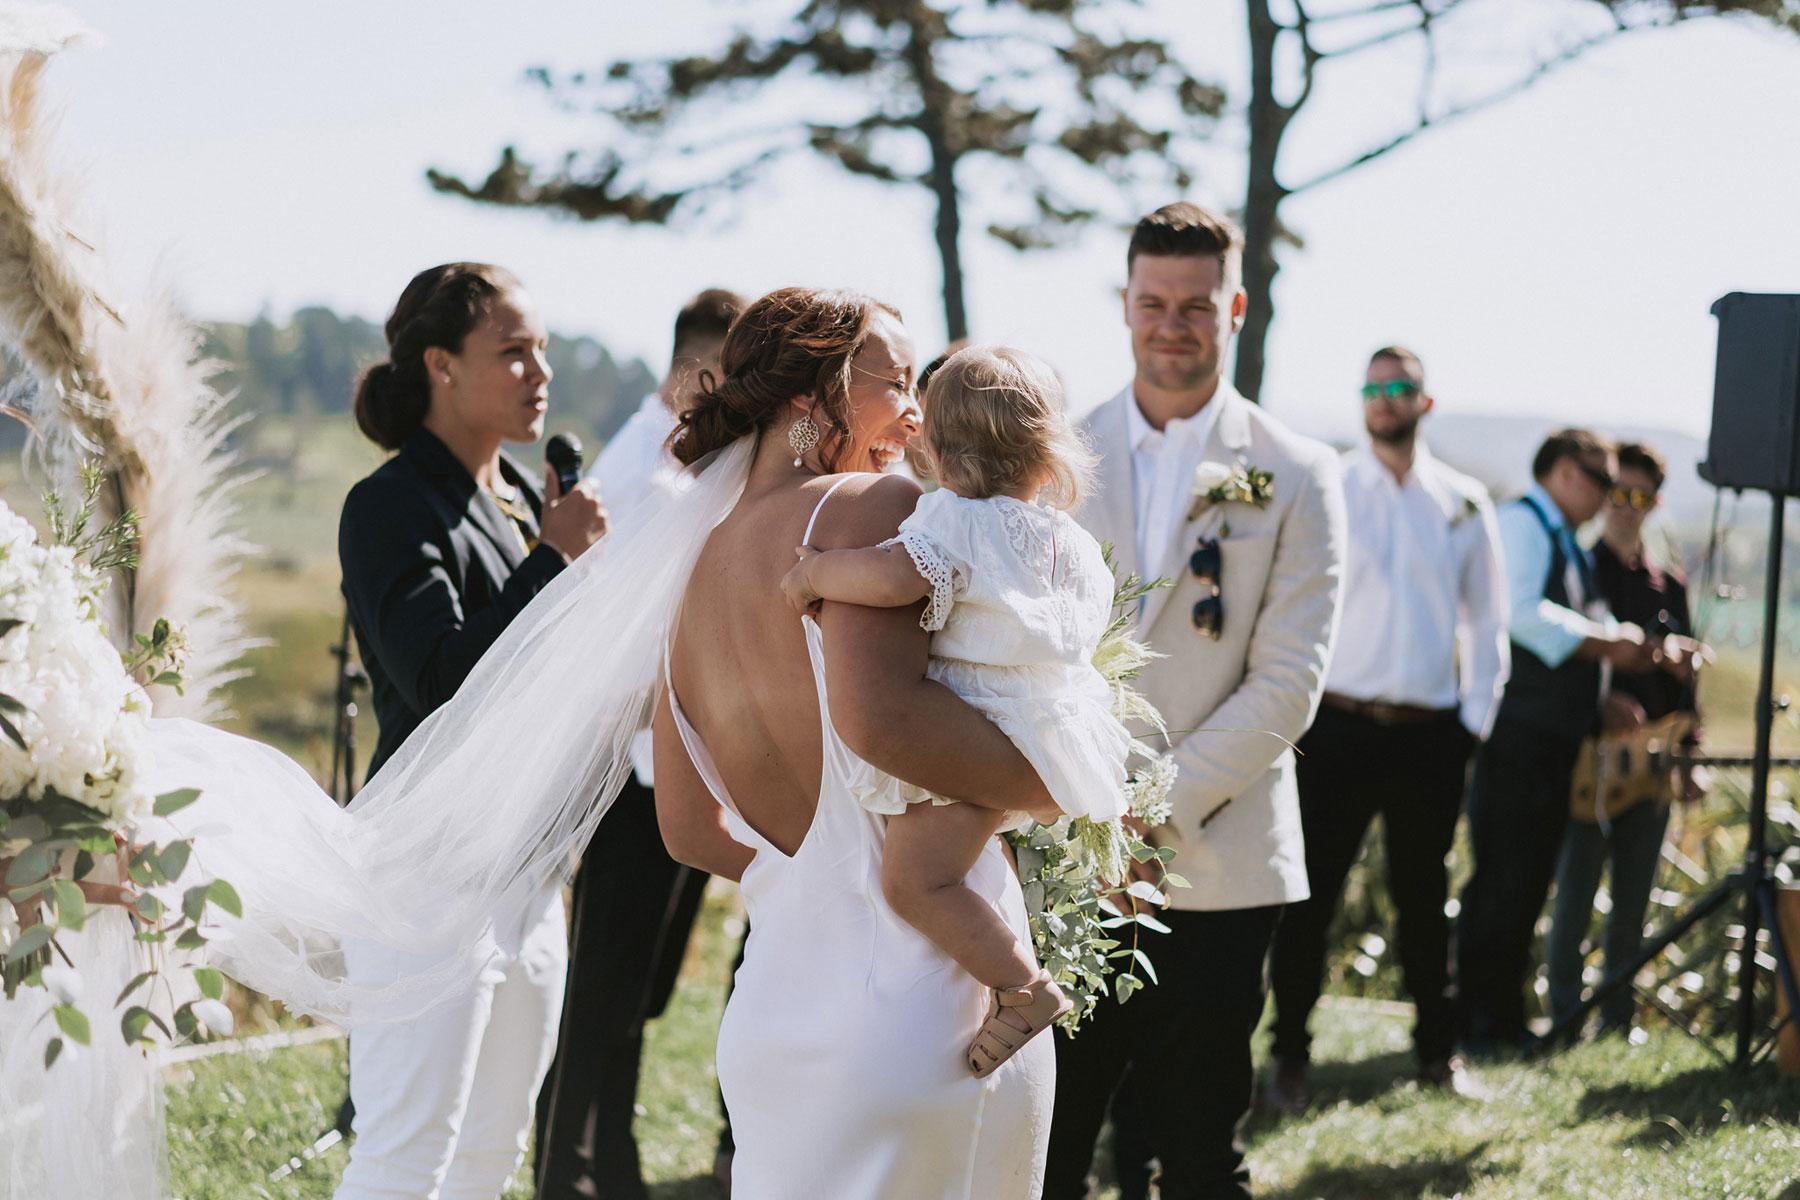 newfound-j-n-orua-beach-house-coromandel-wedding-photographers-415